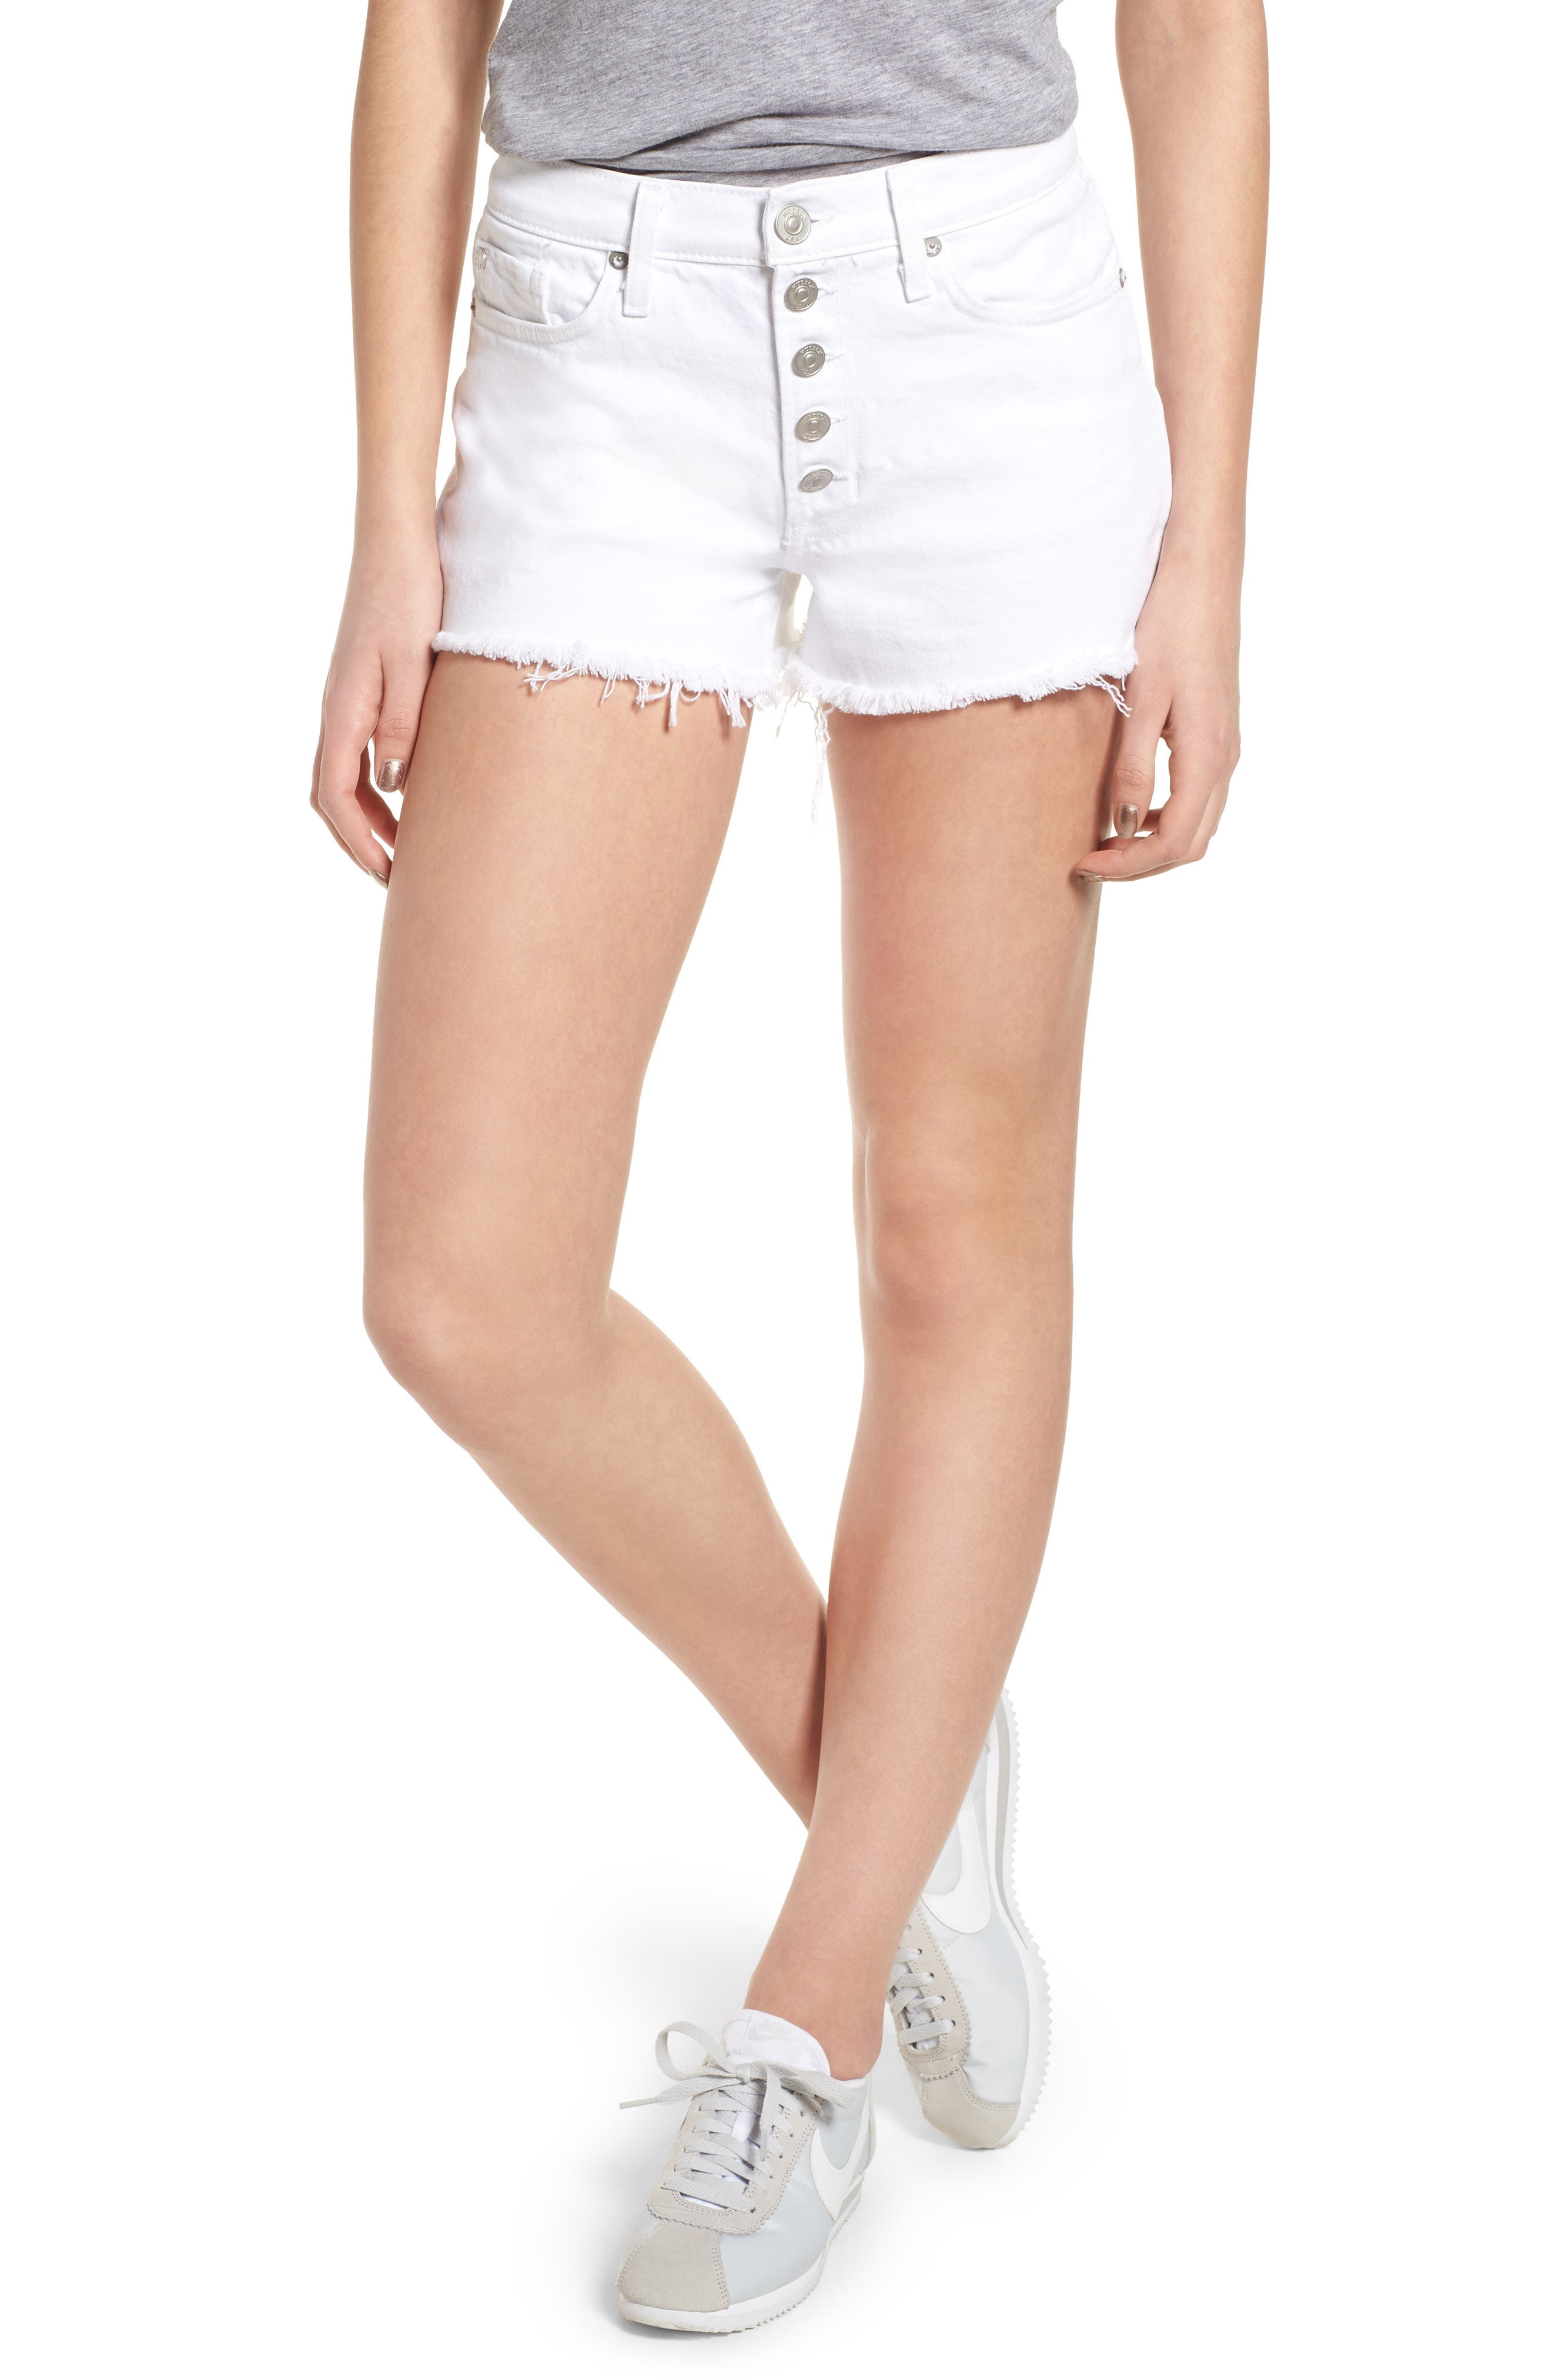 Zoeey Button Fly High Waist Denim Shorts,                             Main thumbnail 1, color,                             White